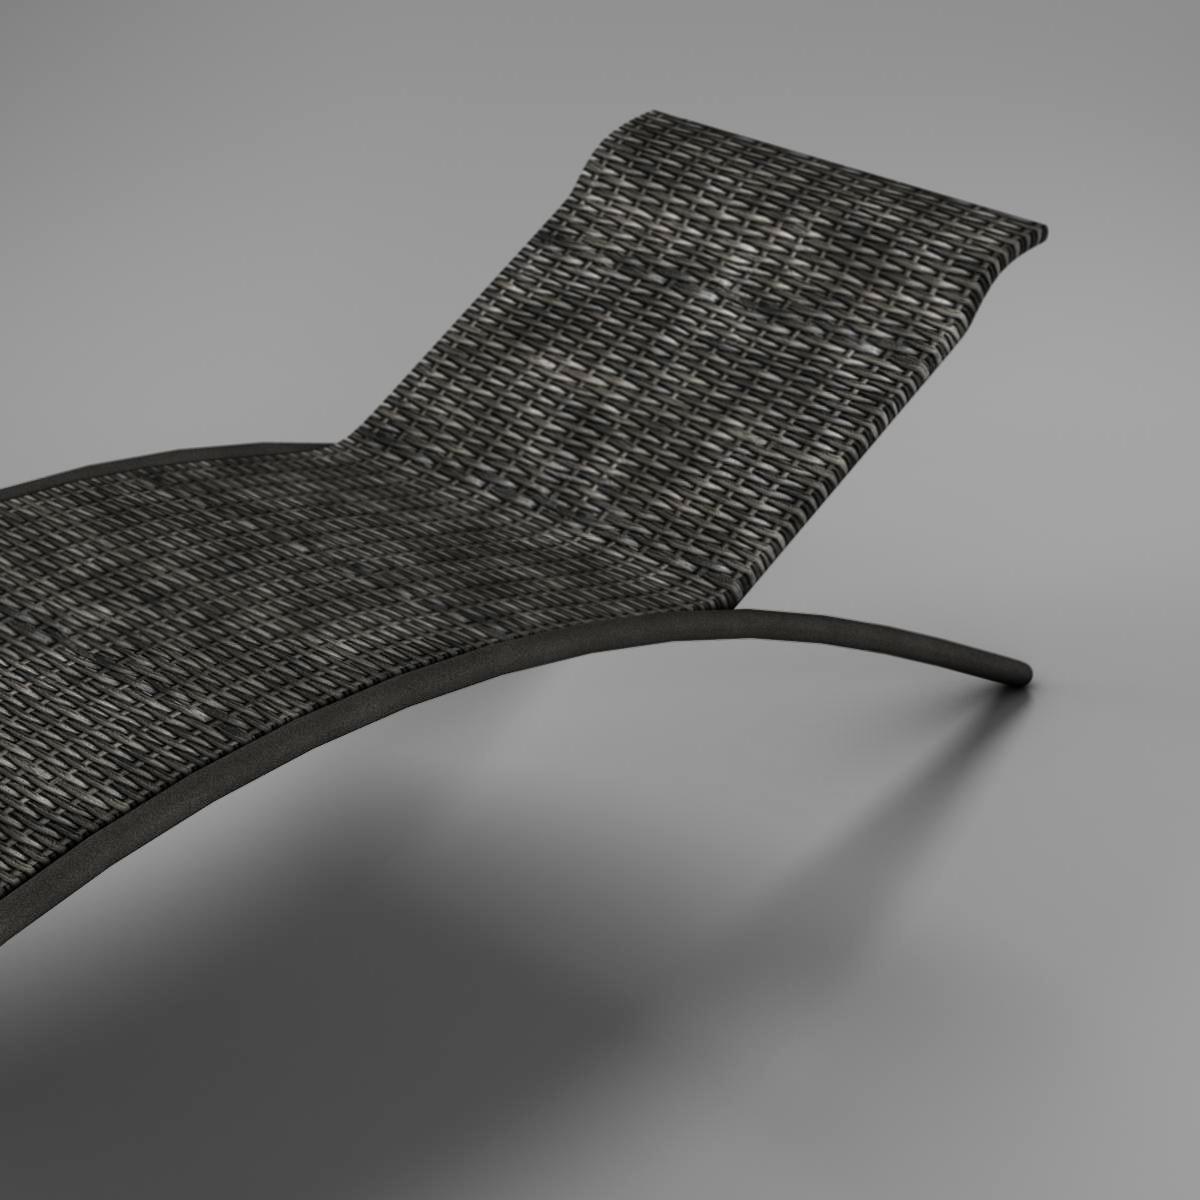 sunbed chair 3d model 3ds max fbx c4d ma mb obj 162643